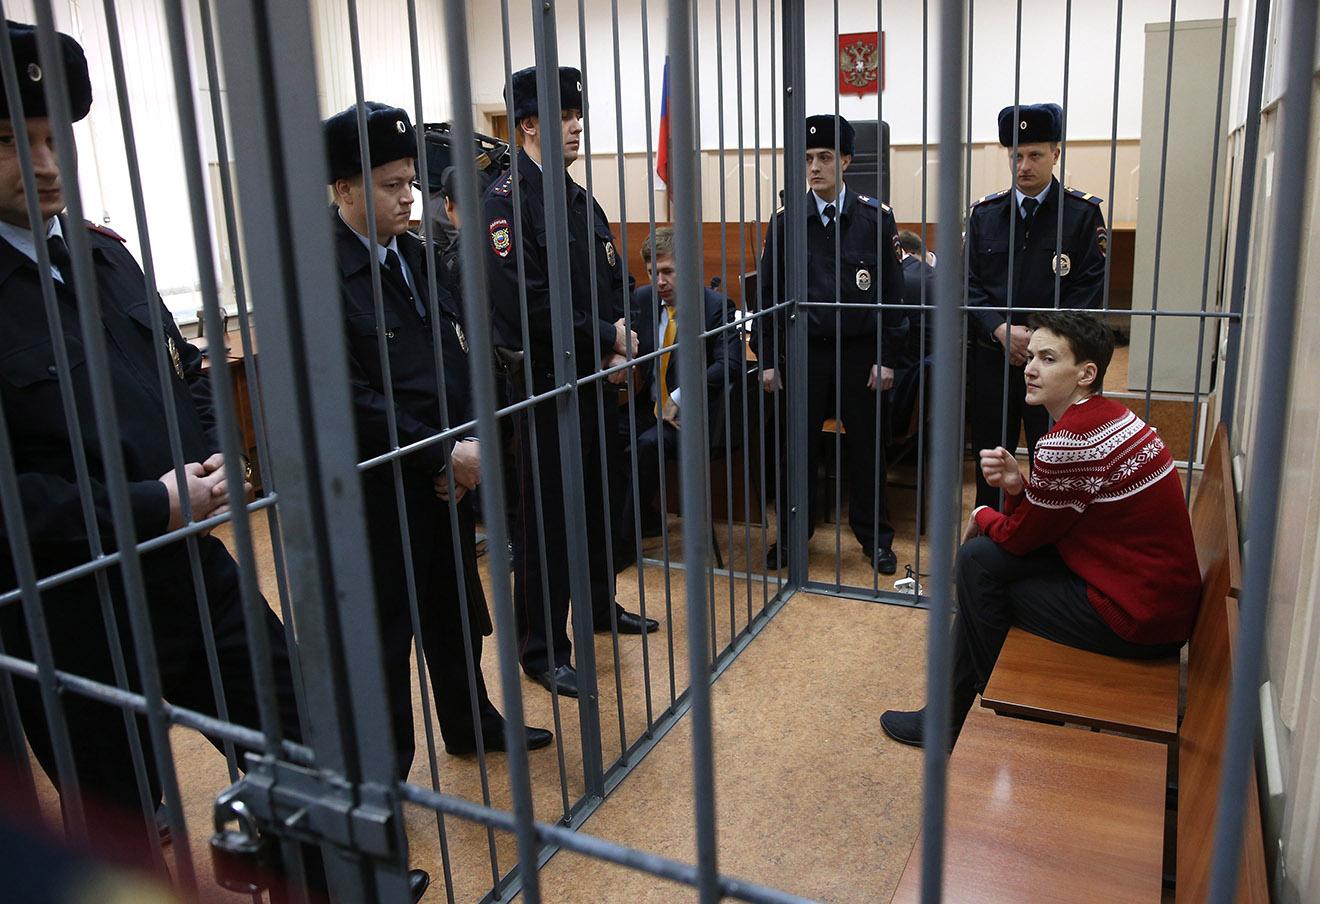 Надежда Савченко в Басманном суде, 3 марта 2015 года.